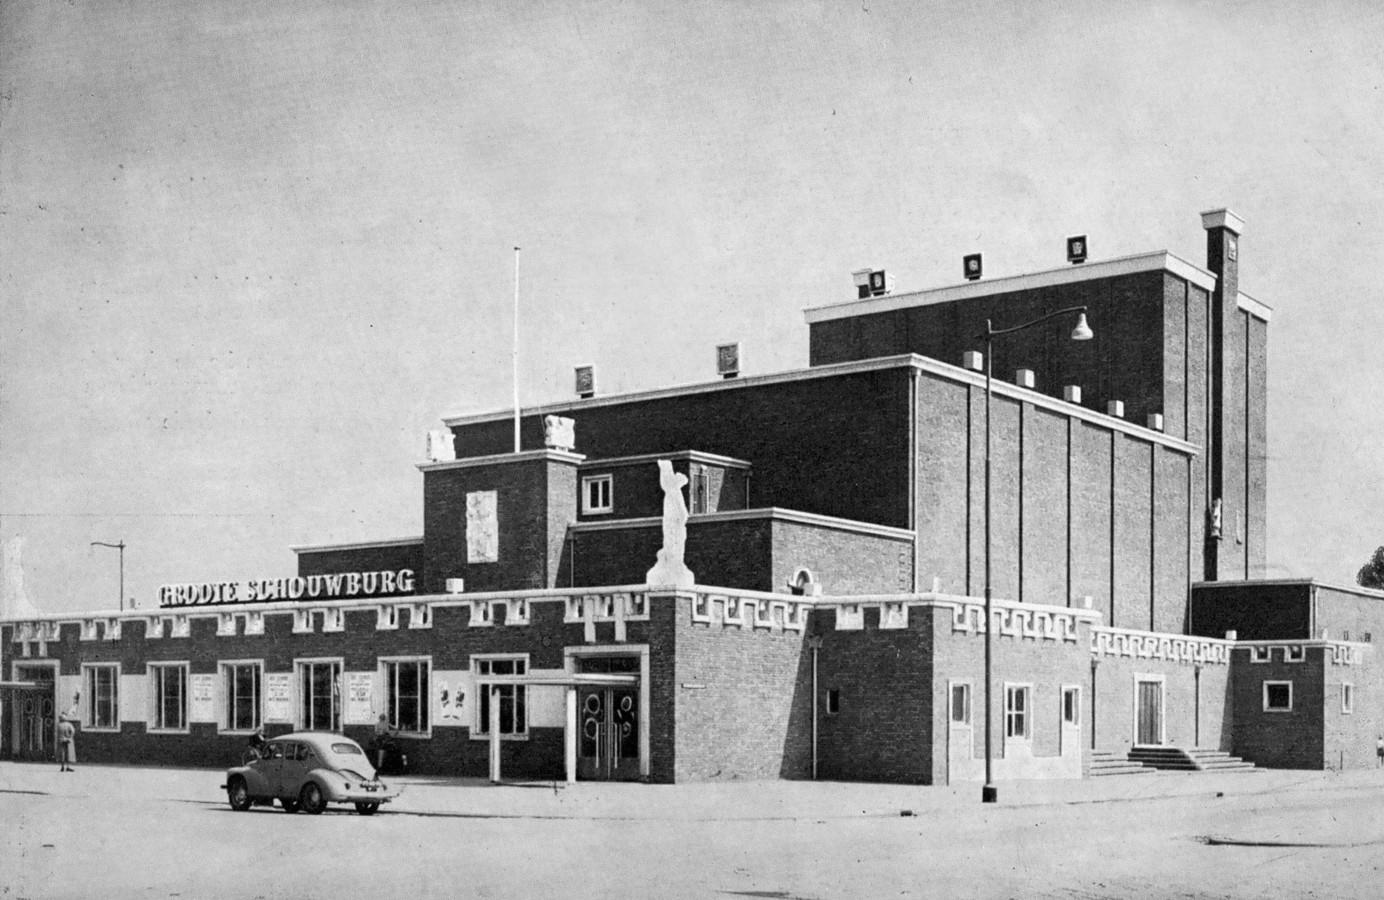 Theater Zuidplein opende in 1954 als de Groote Schouwburg